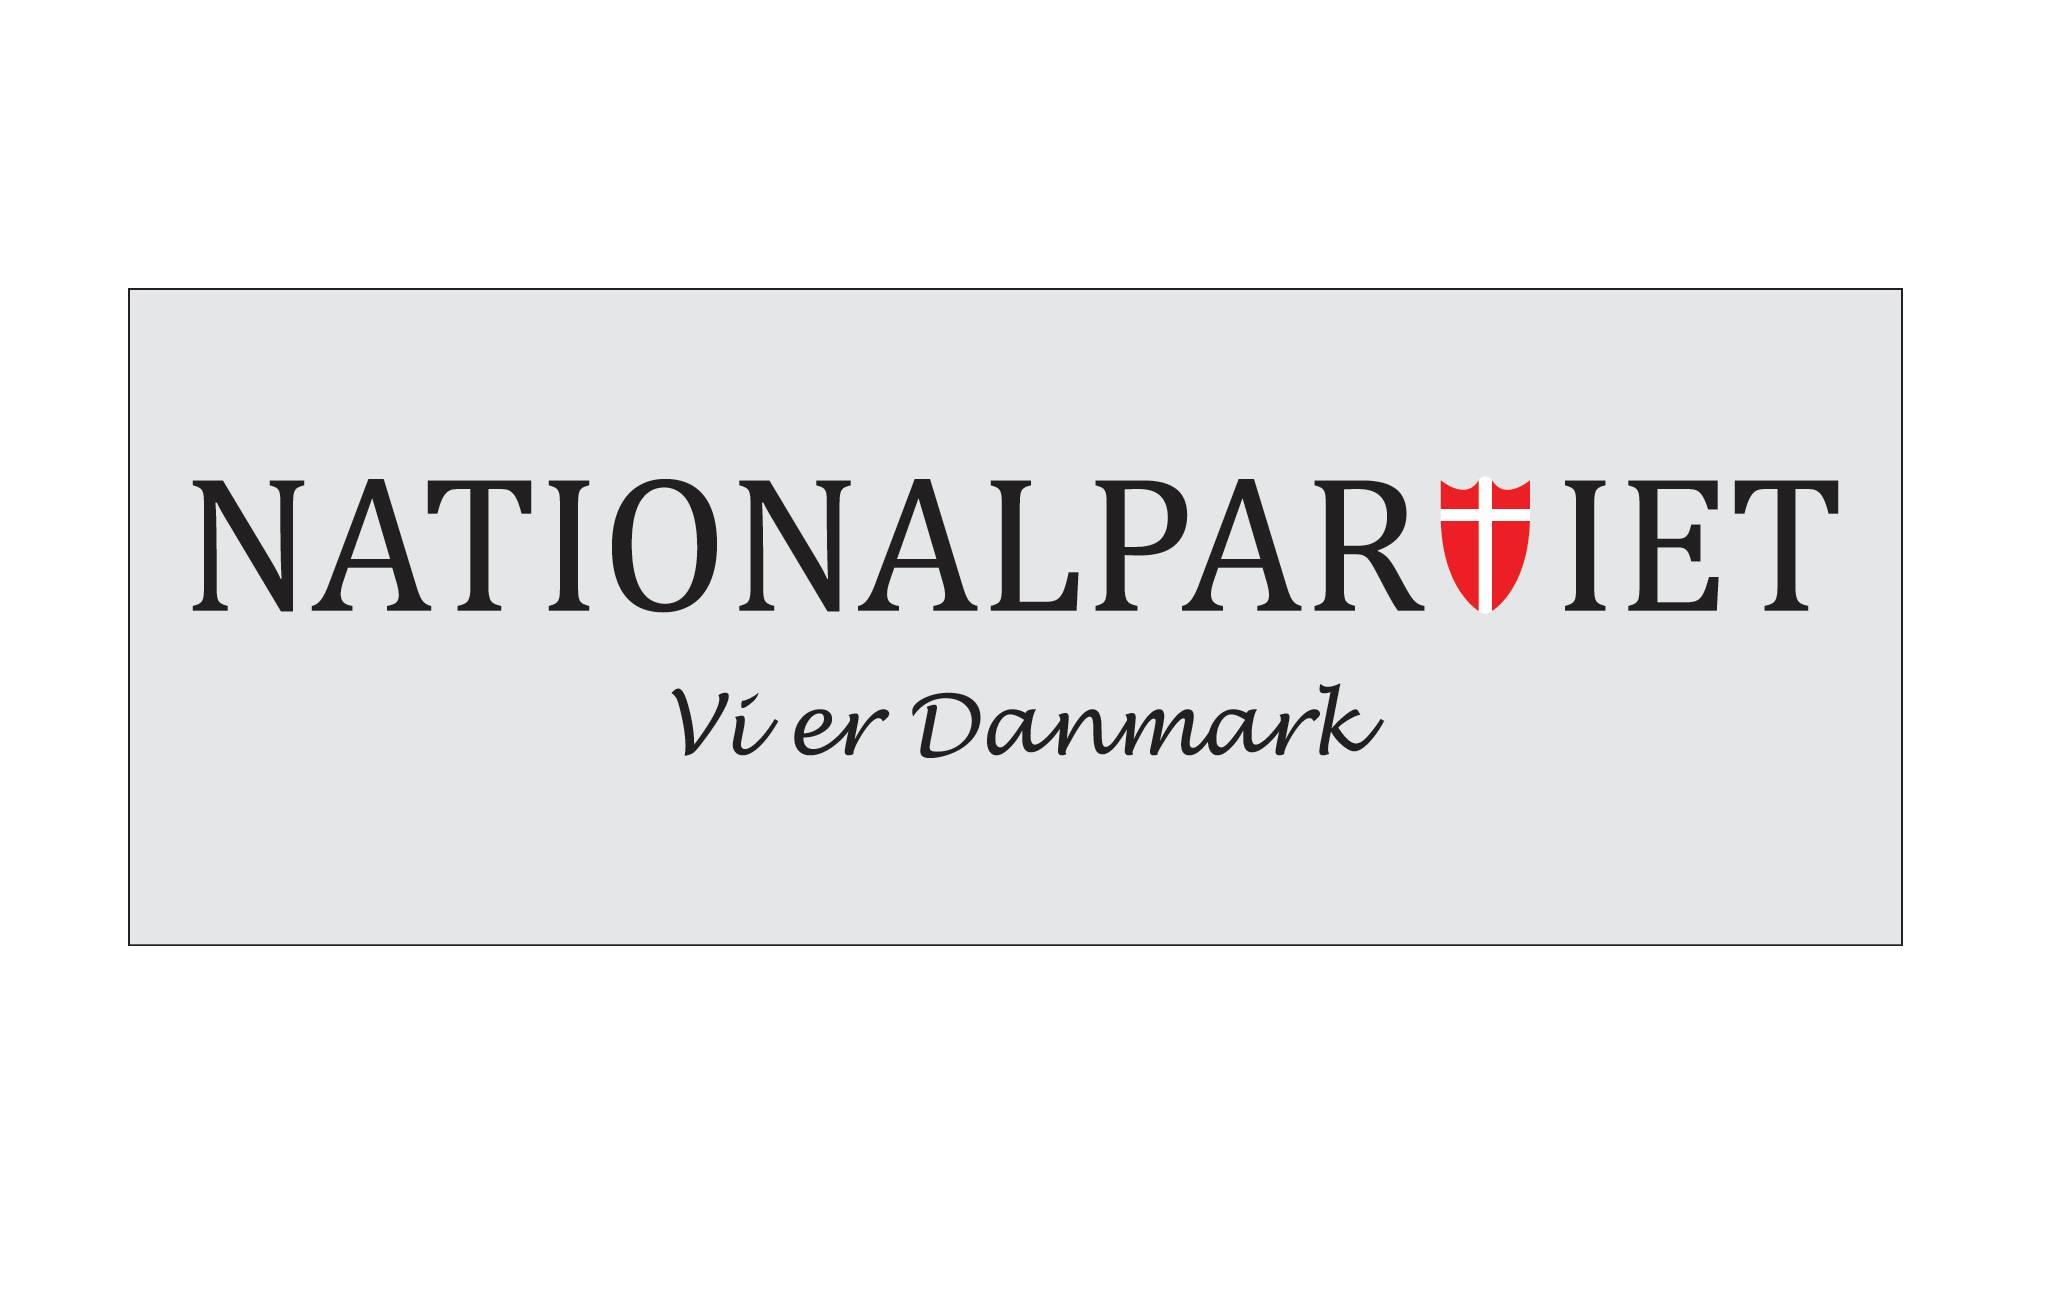 nationalpartiet.png